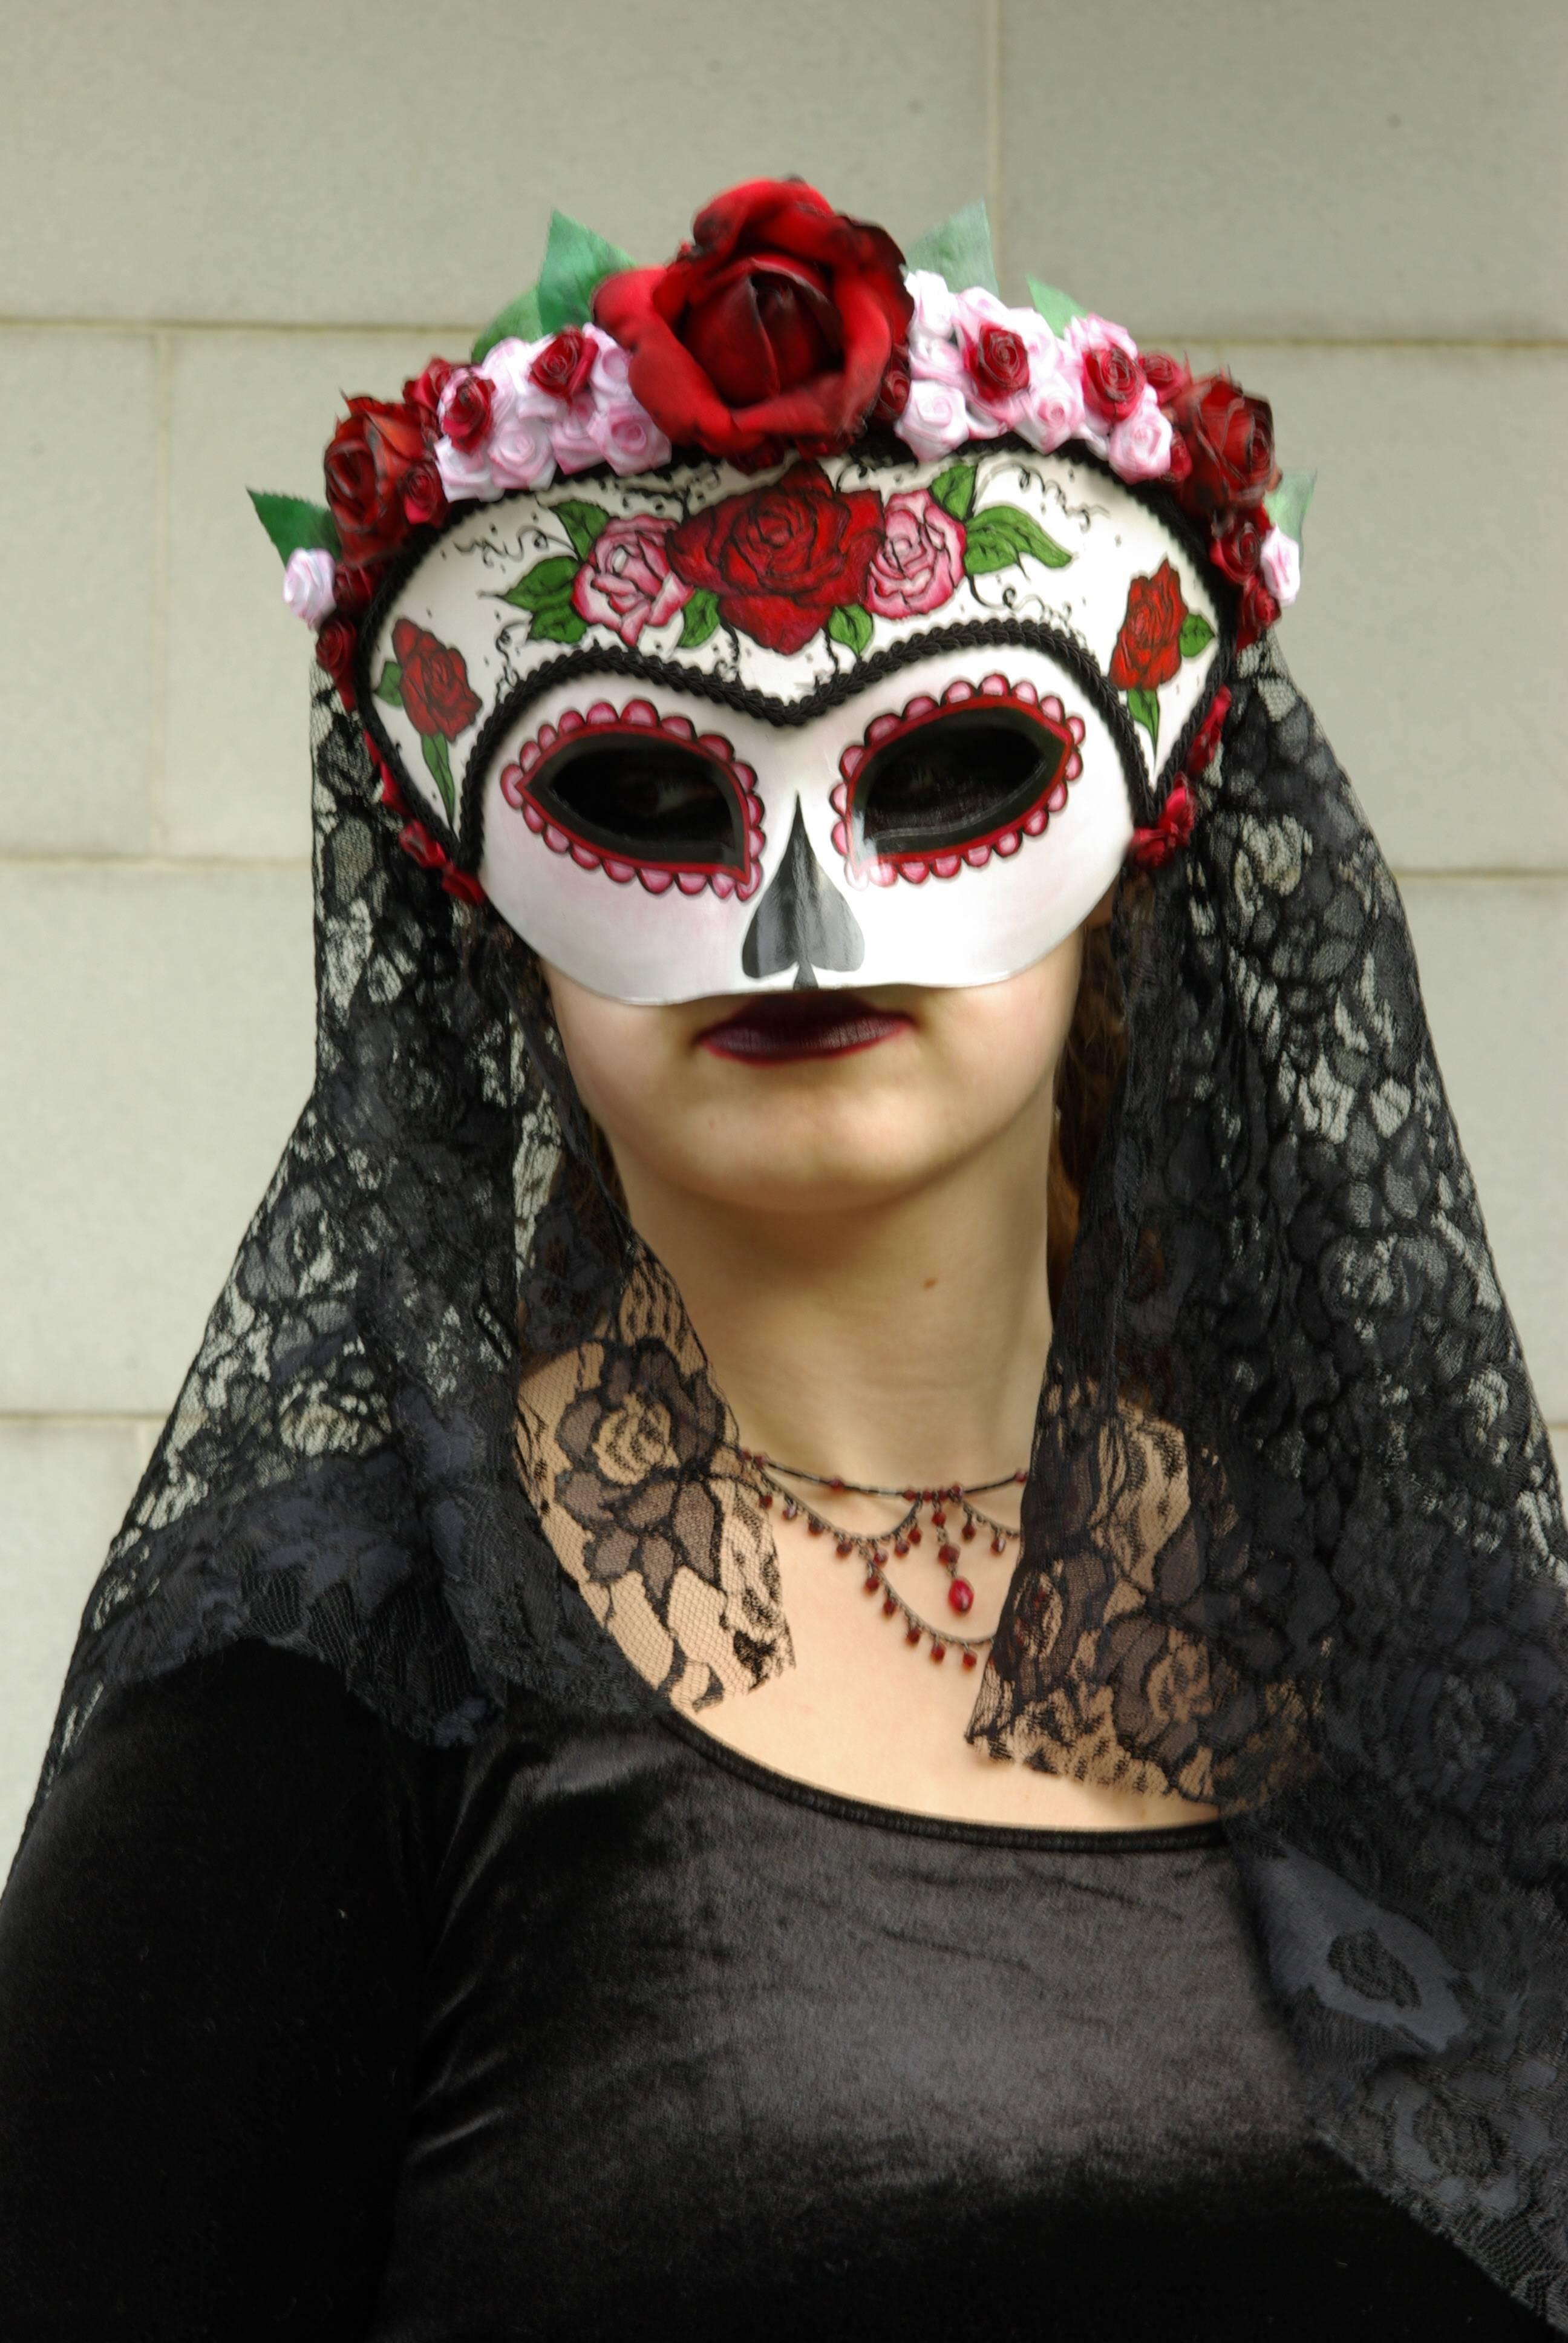 Mask-Princesa Rosa by EffigyMasks